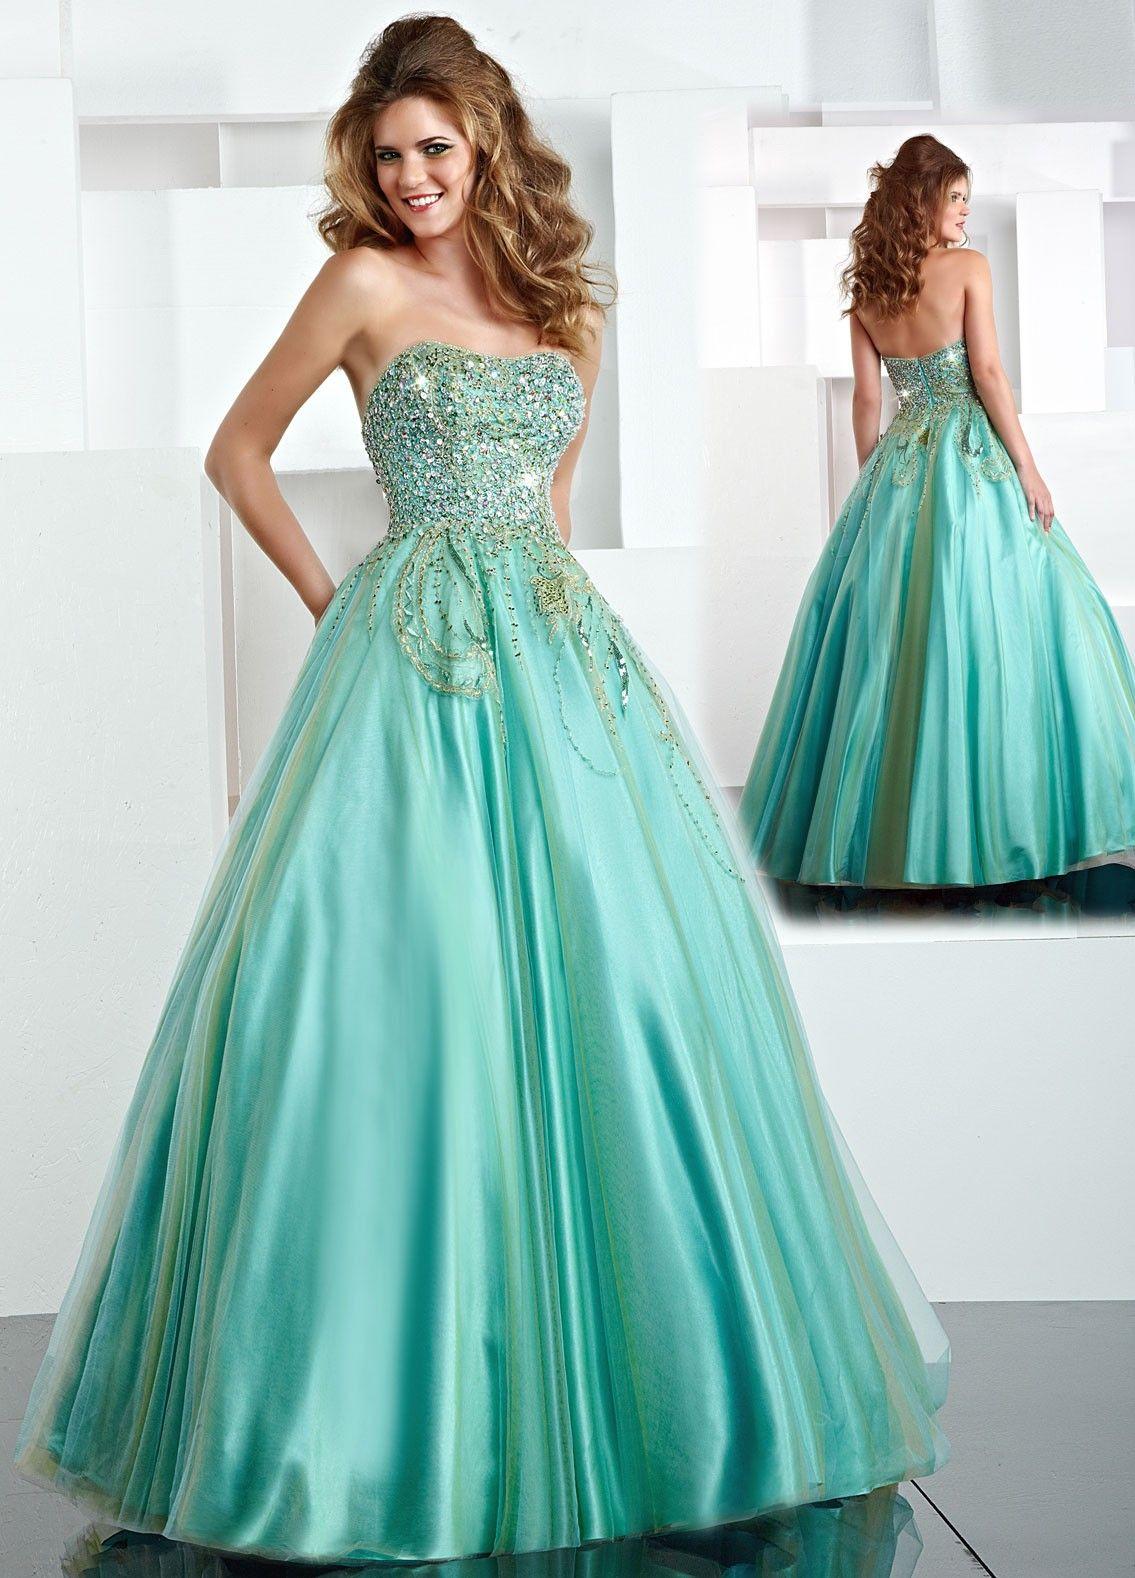 Hand beaded prom dresses - Best Dressed